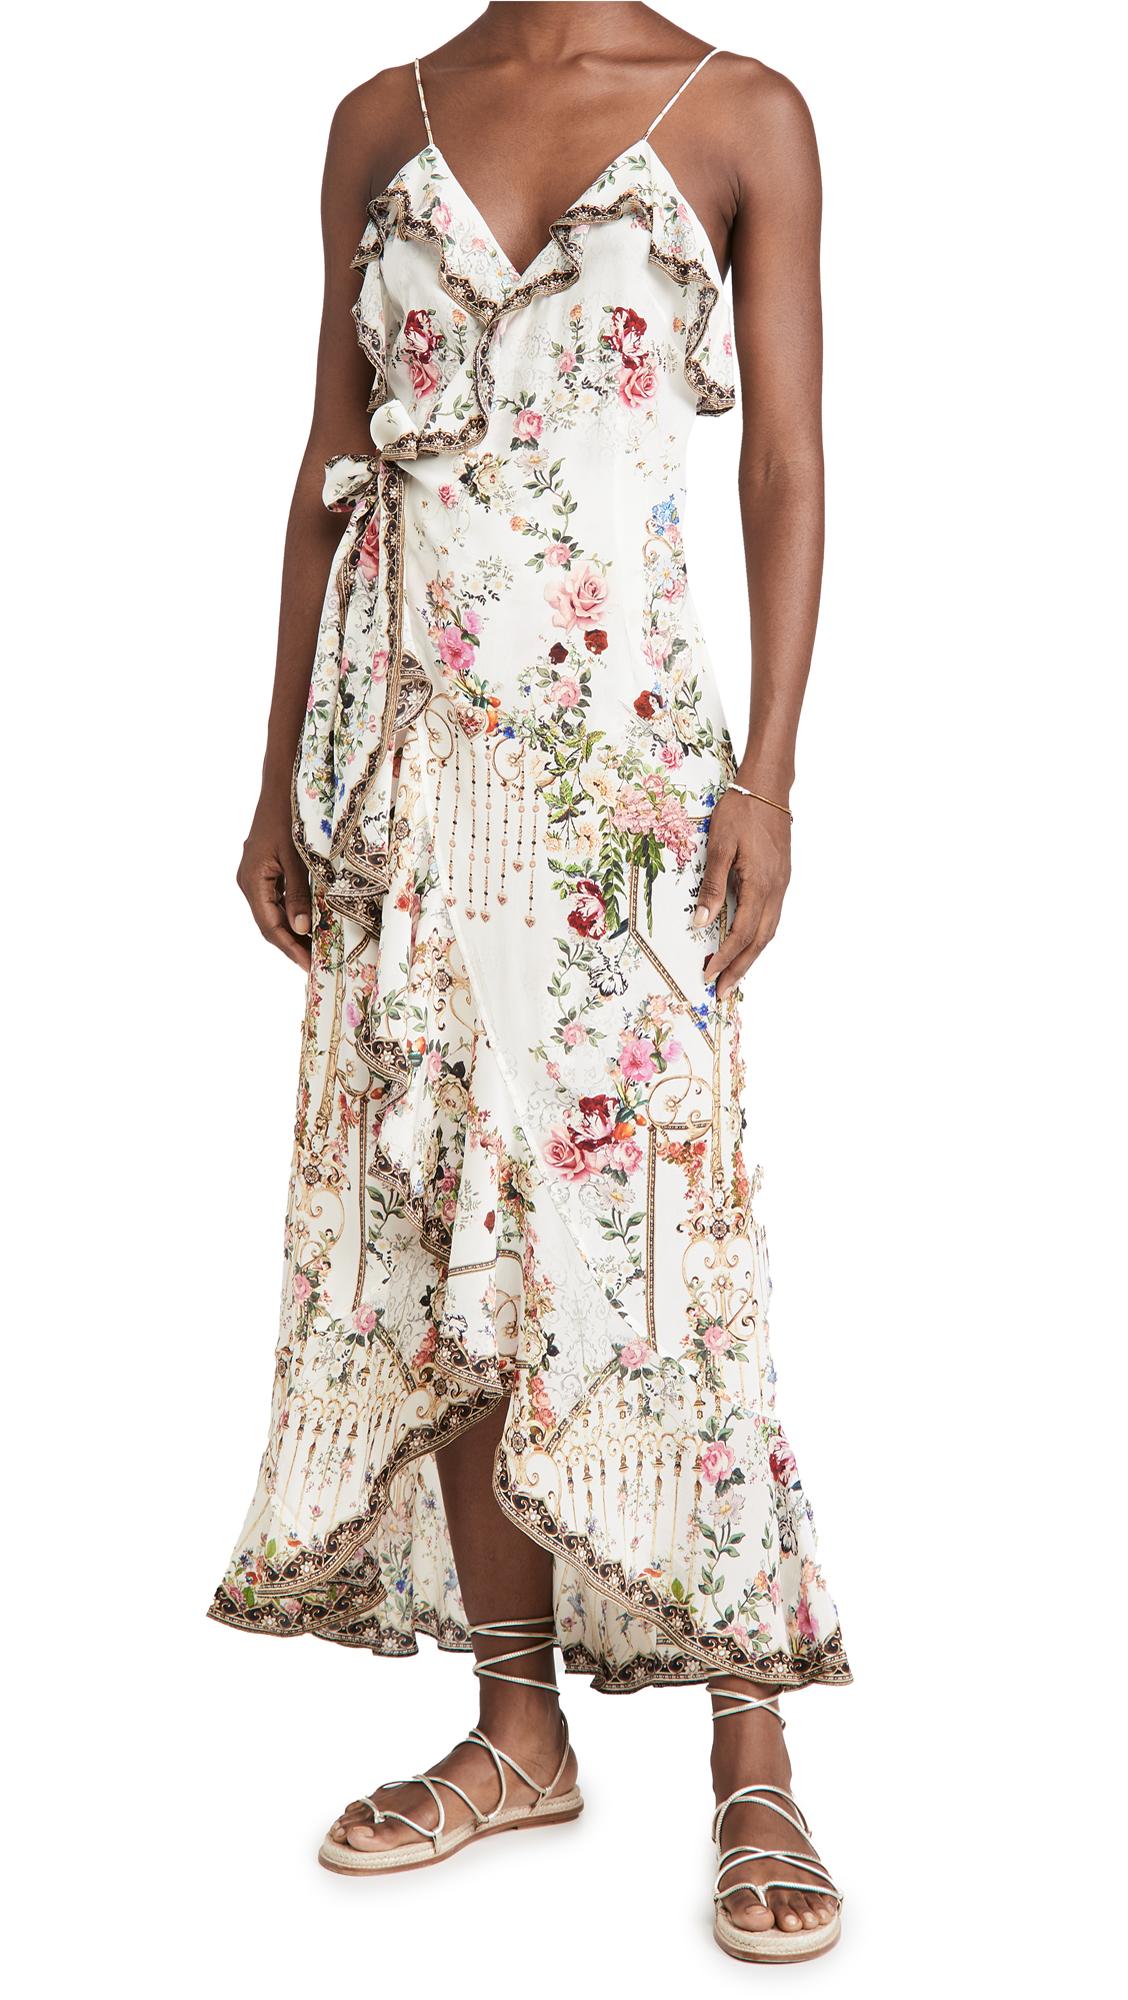 Camilla Long Wrap Dress with Frill